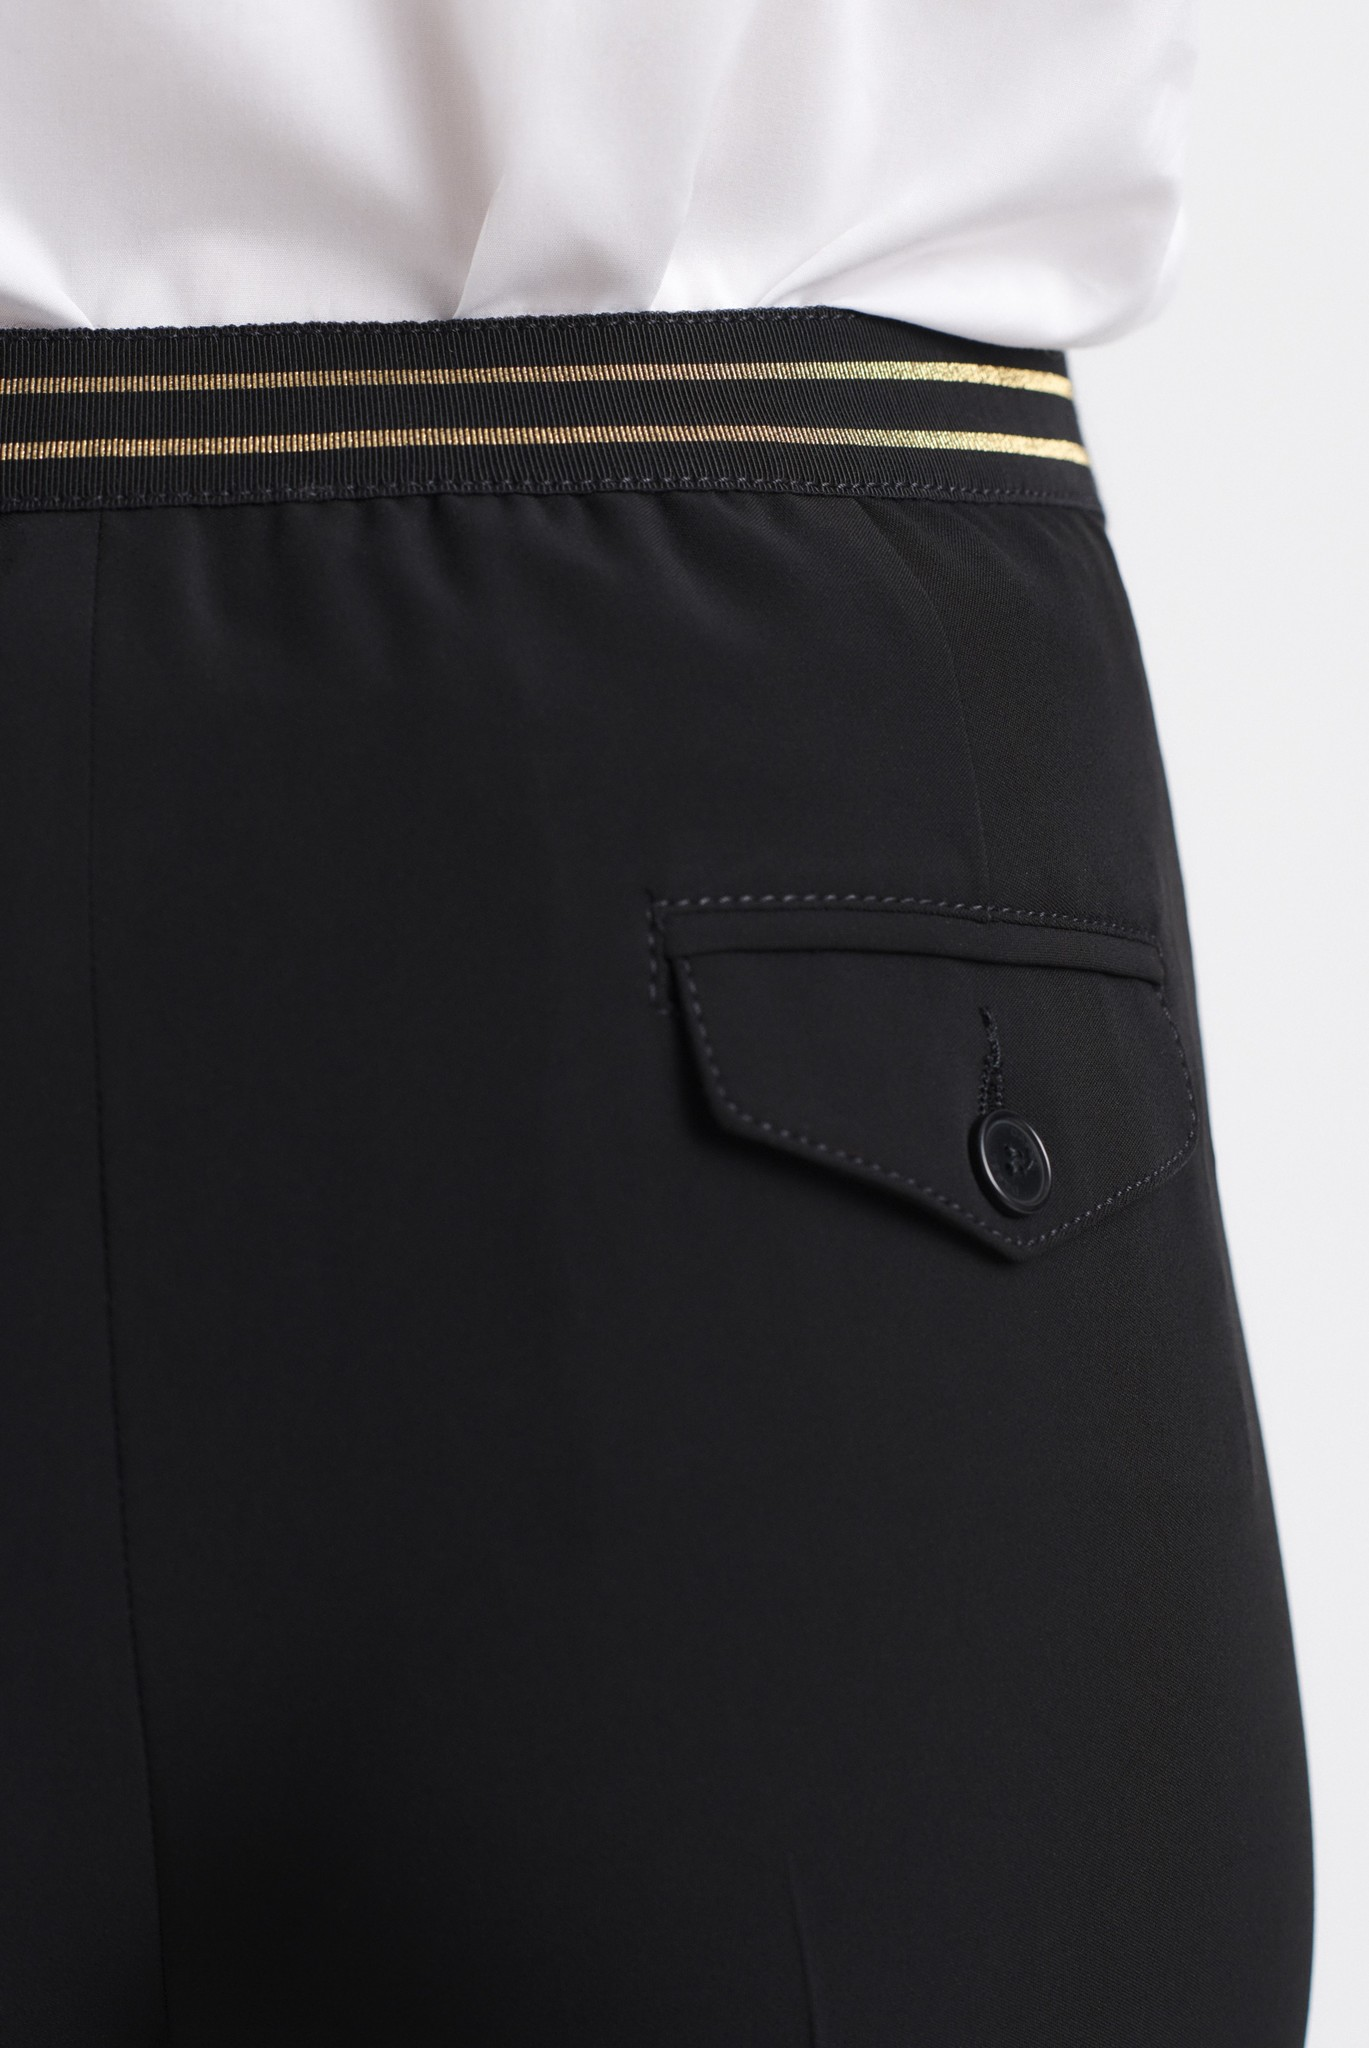 MARZIA - брюки из крепа прямого кроя